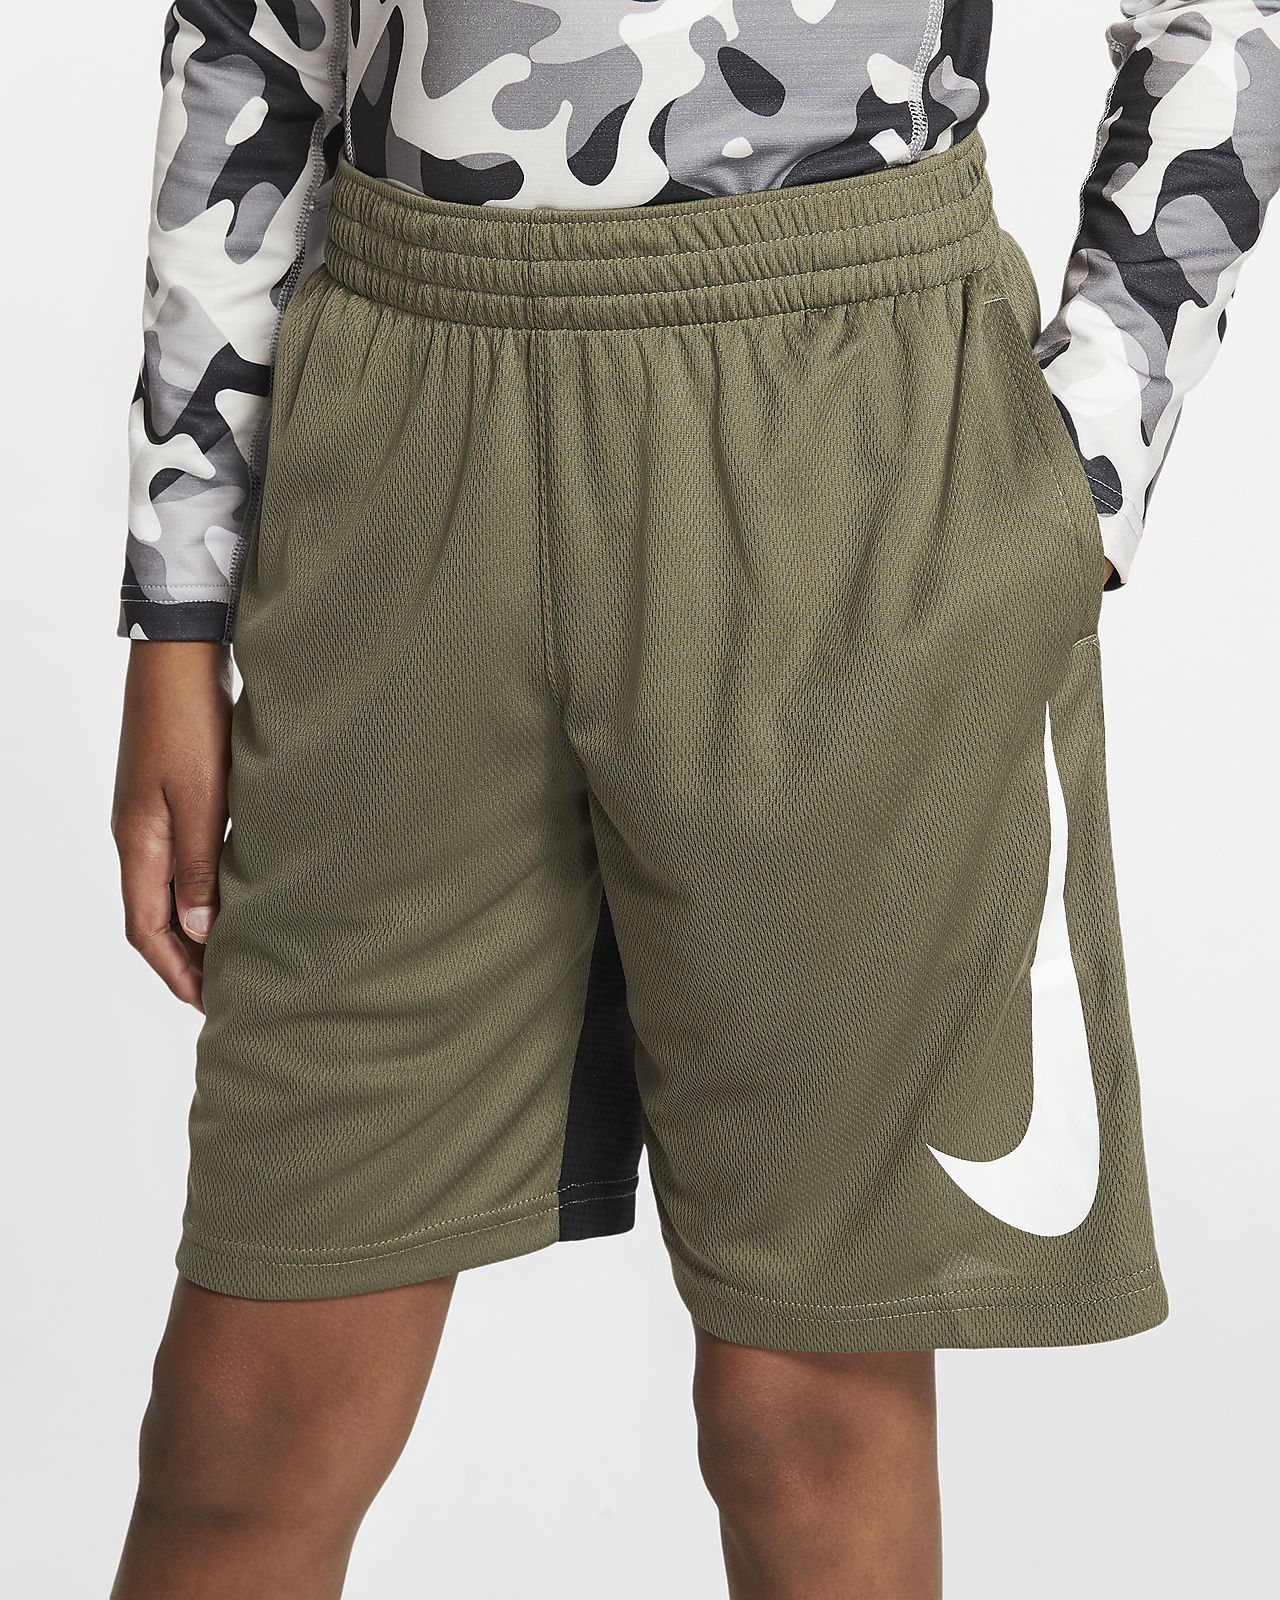 Shorts de básquetbol para niños talla grande Nike Dri-FIT